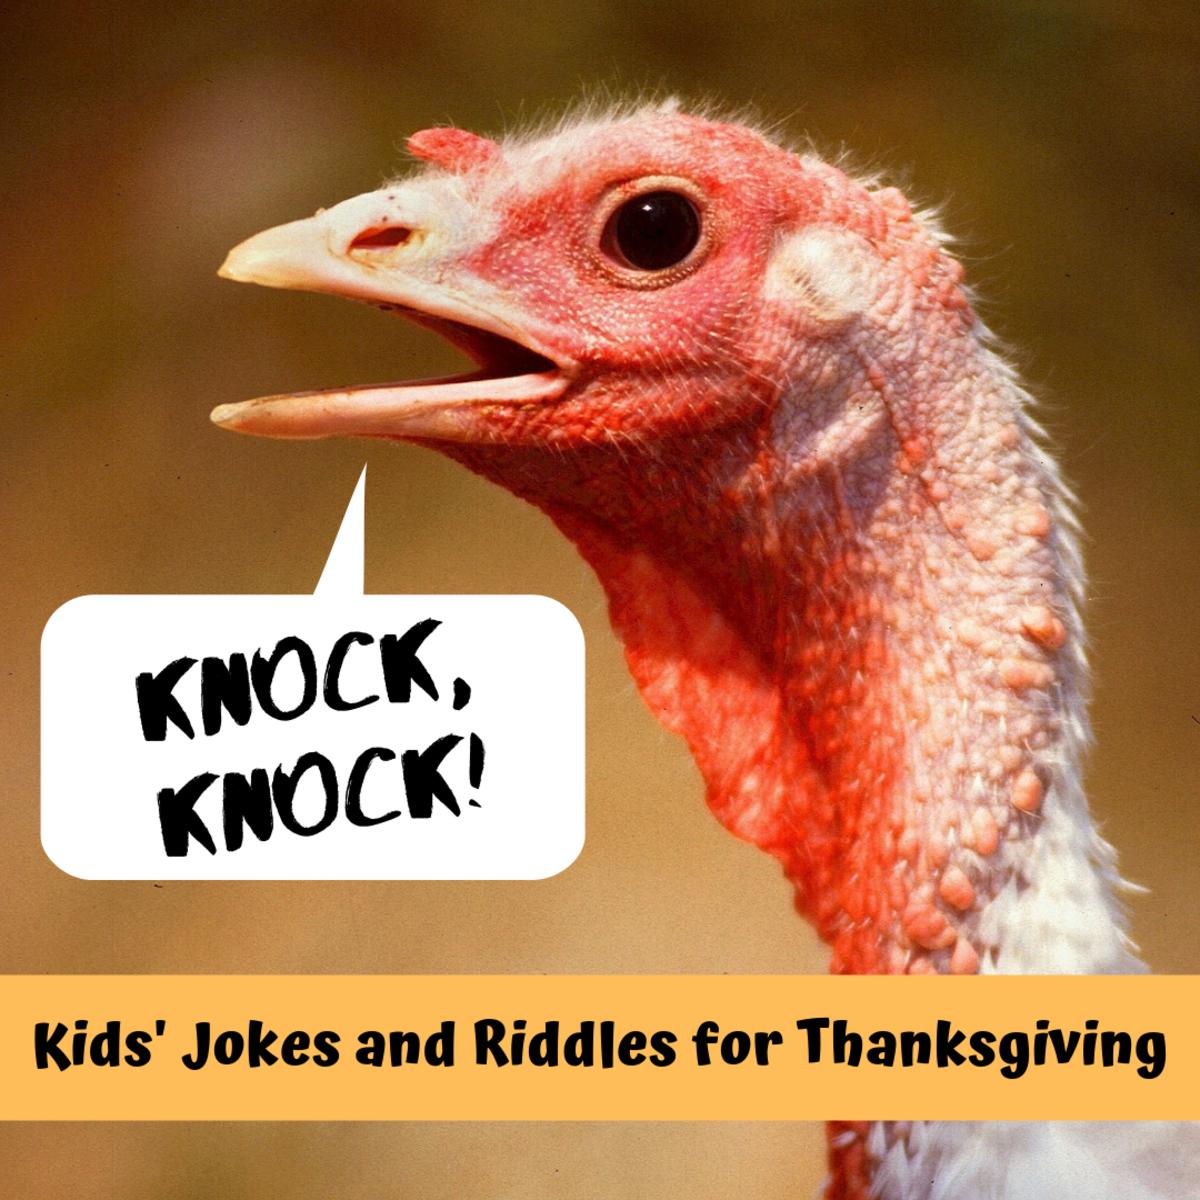 Thanksgiving Knock-Knock Jokes and Riddles for Kids